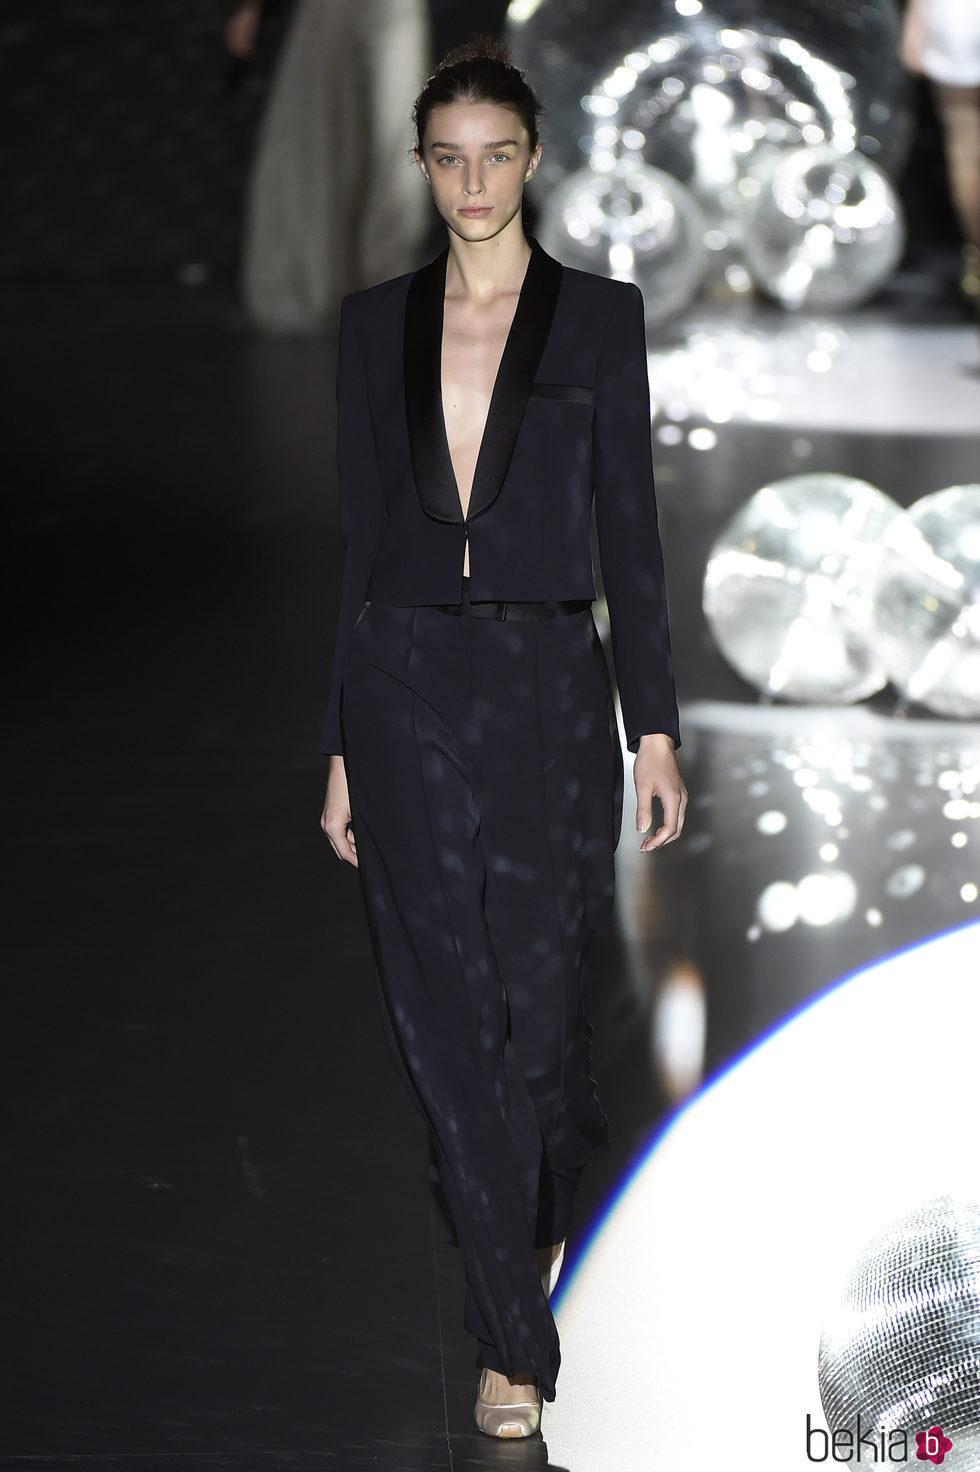 Traje pantalón azul marino de Teresa Helbig primavera/verano 2017 en Madrid Fashion Week